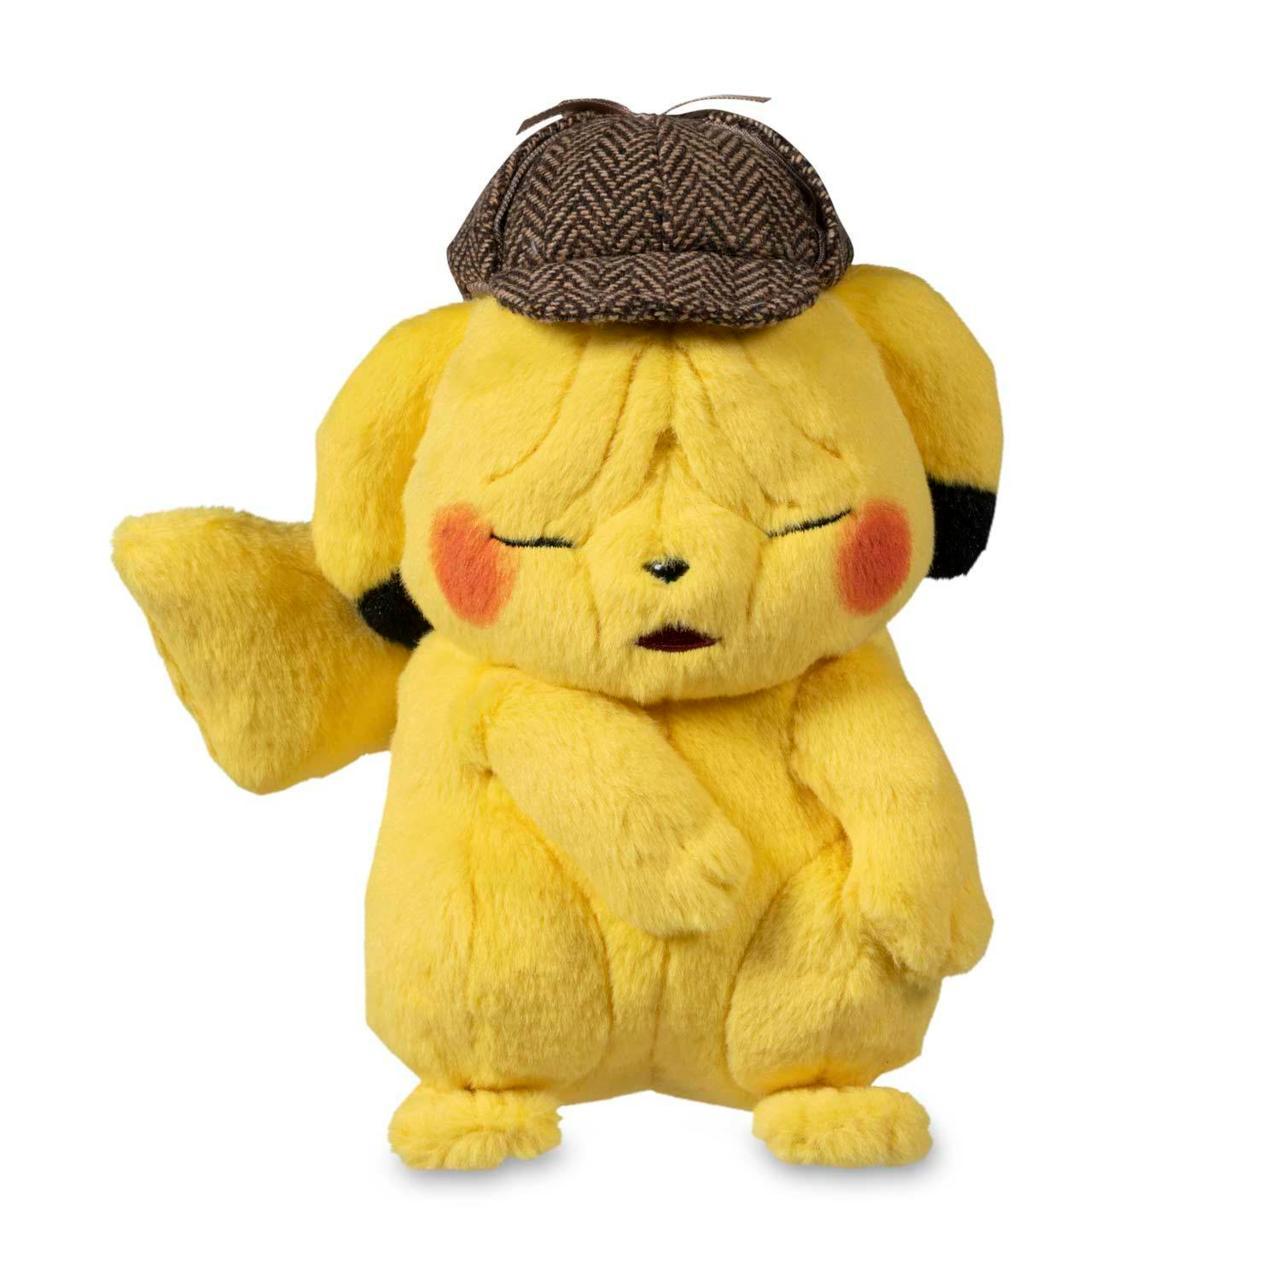 Pokemon: Detective Pikachu Wrinkled-Face Plush